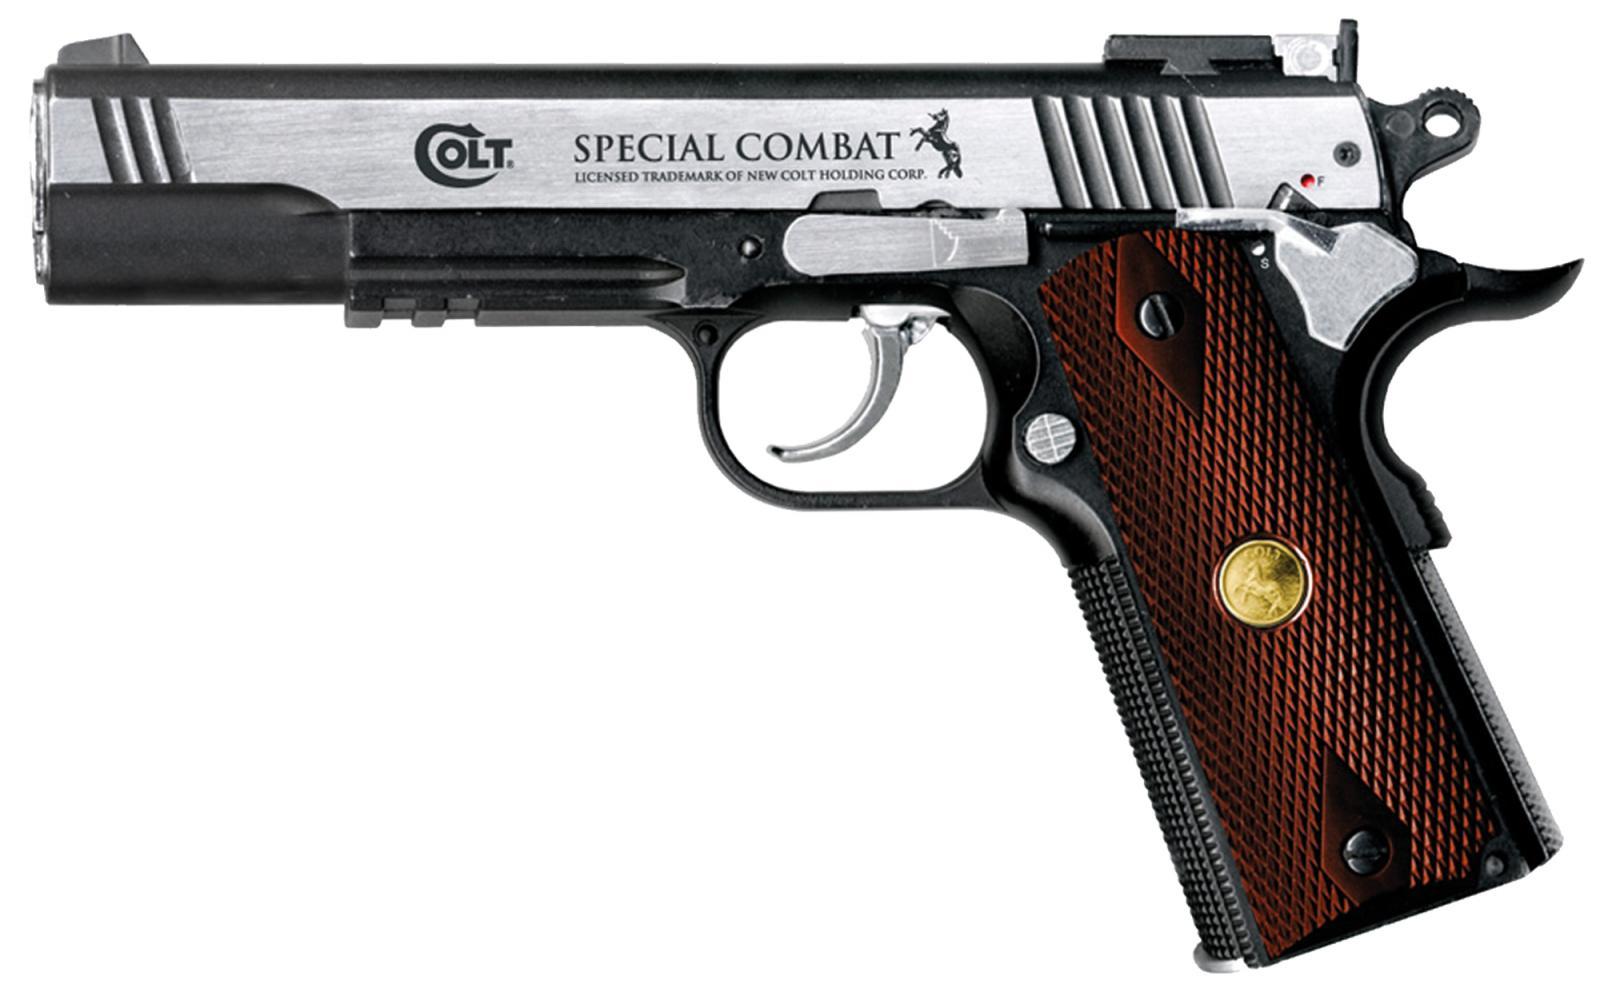 Pistolet C02 COLT Special Combat classic cal 4.5 mm